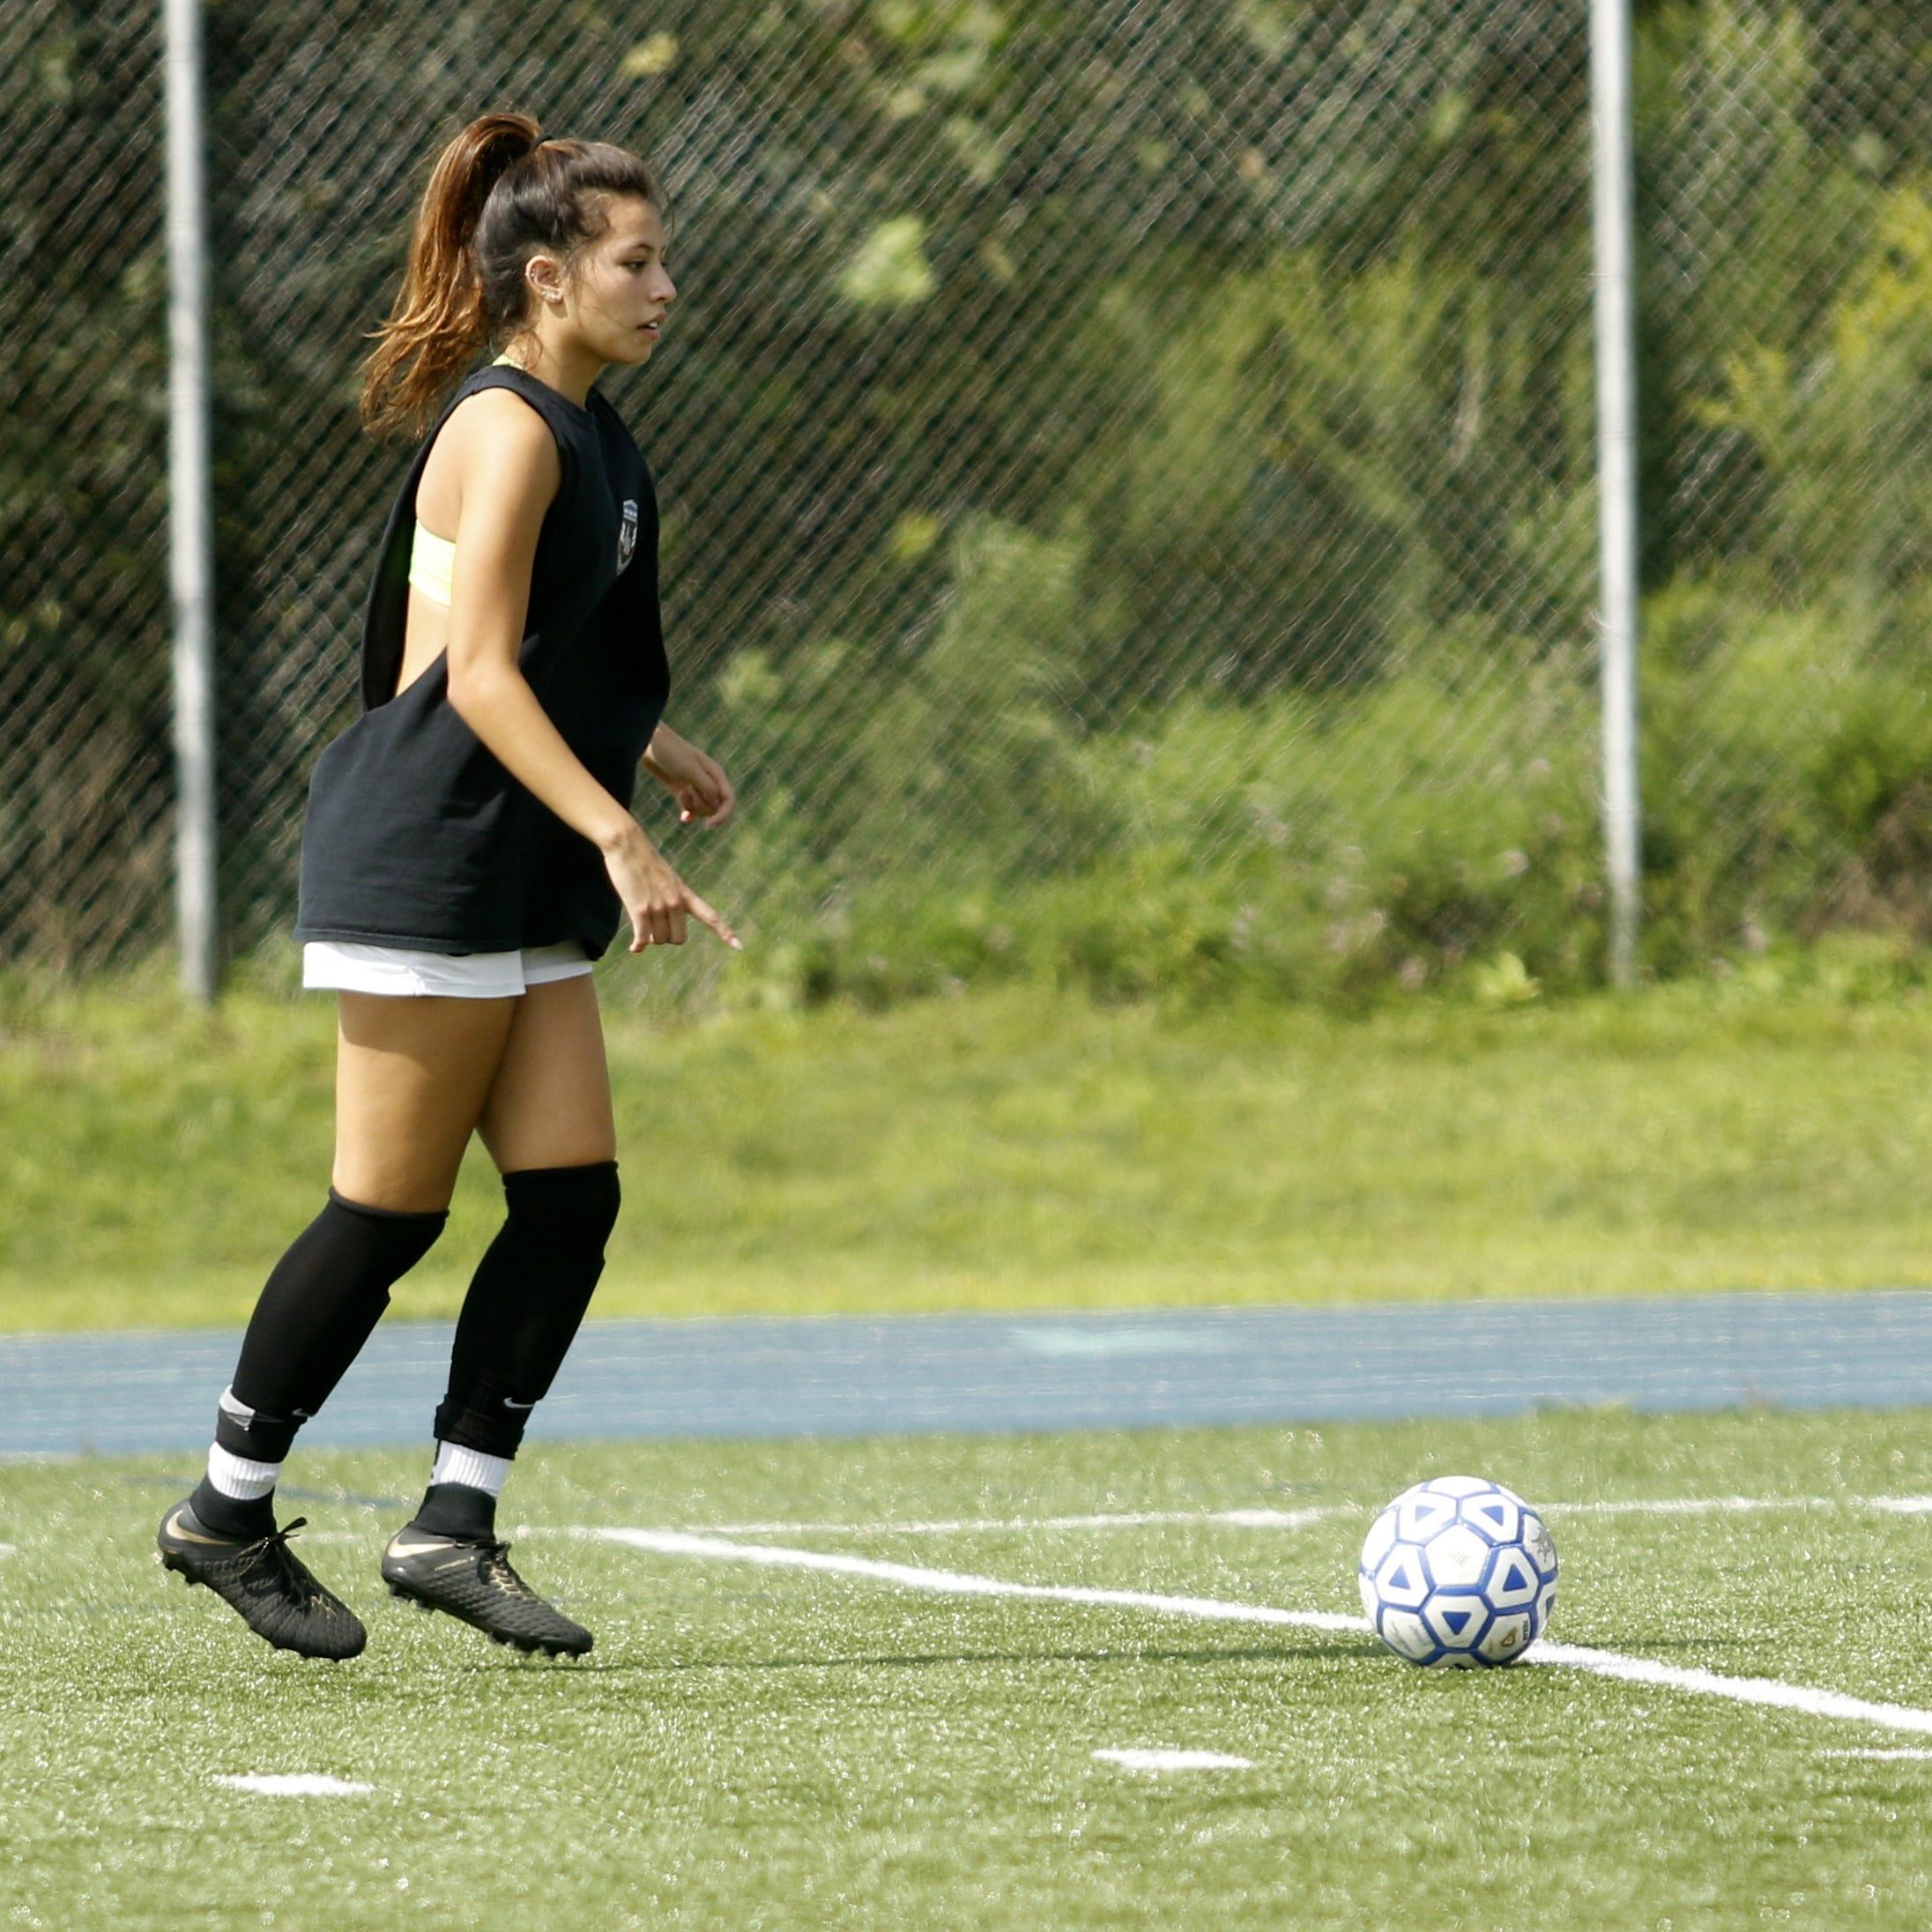 Laurel Vargas' career at Elmira Notre Dame one of titles, friendships and goals